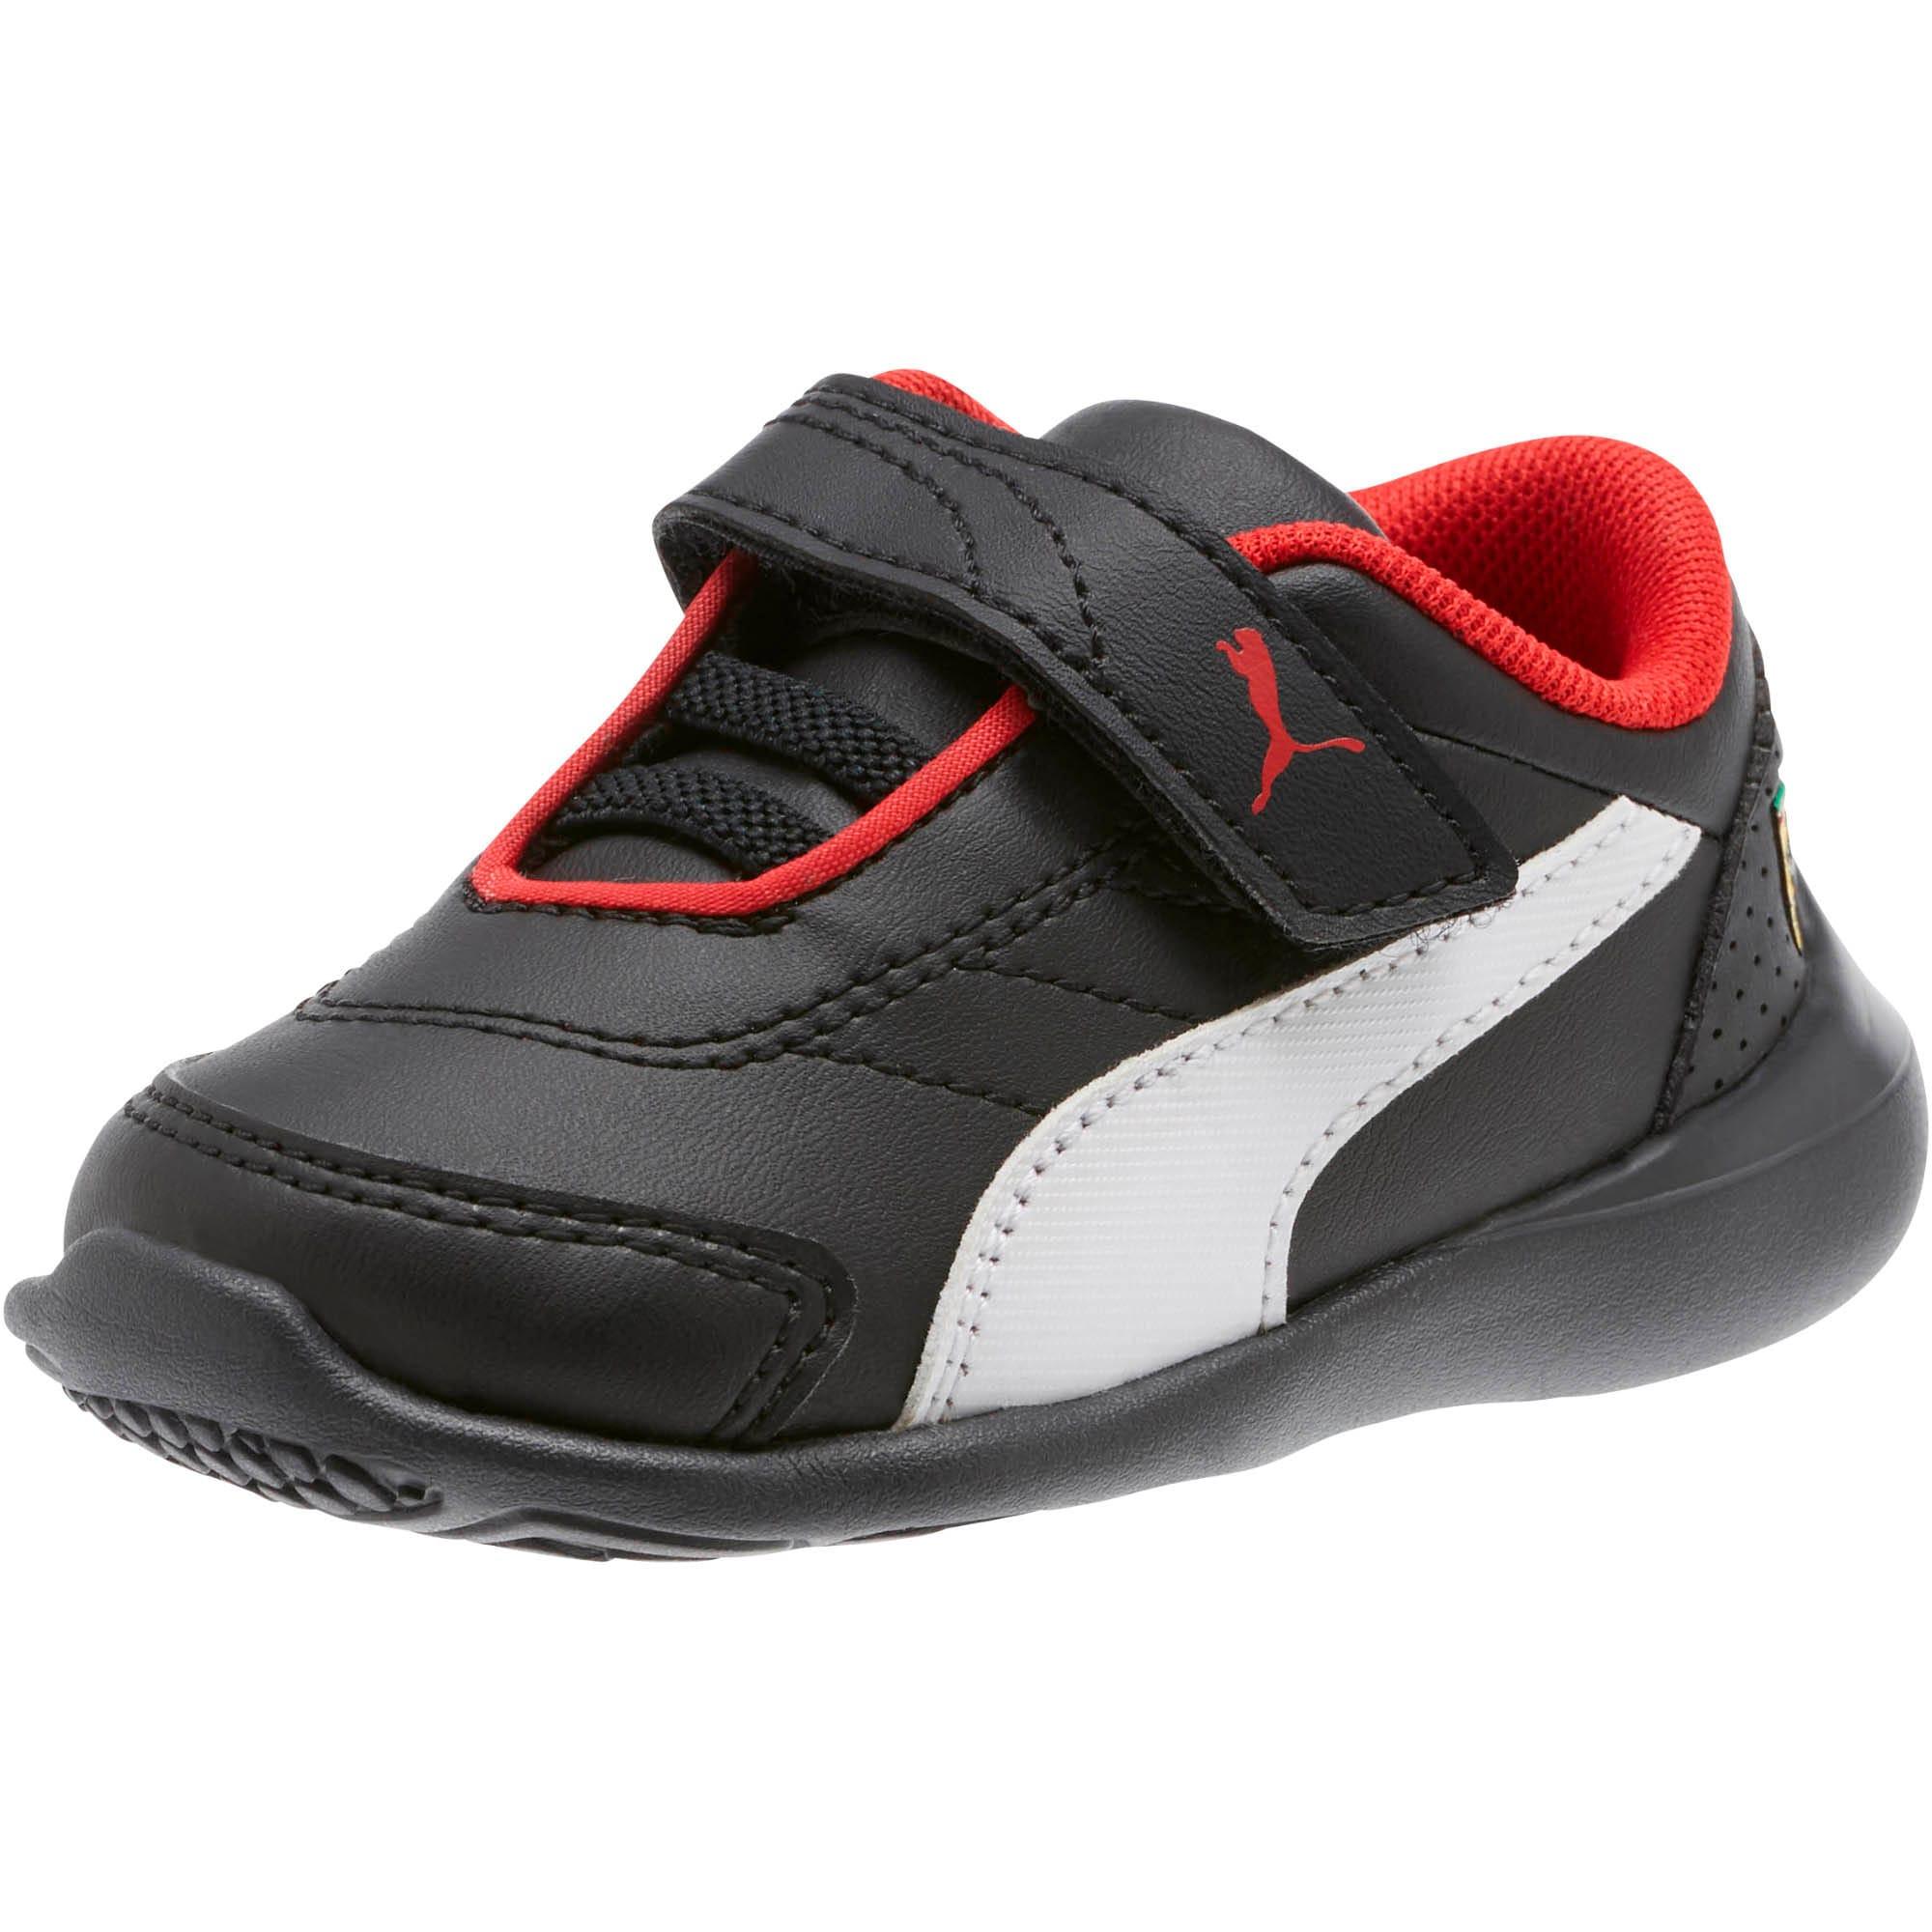 Miniatura 1 de Zapatos Scuderia Ferrari Kart Cat III para bebés, Puma Black-Puma White, mediano